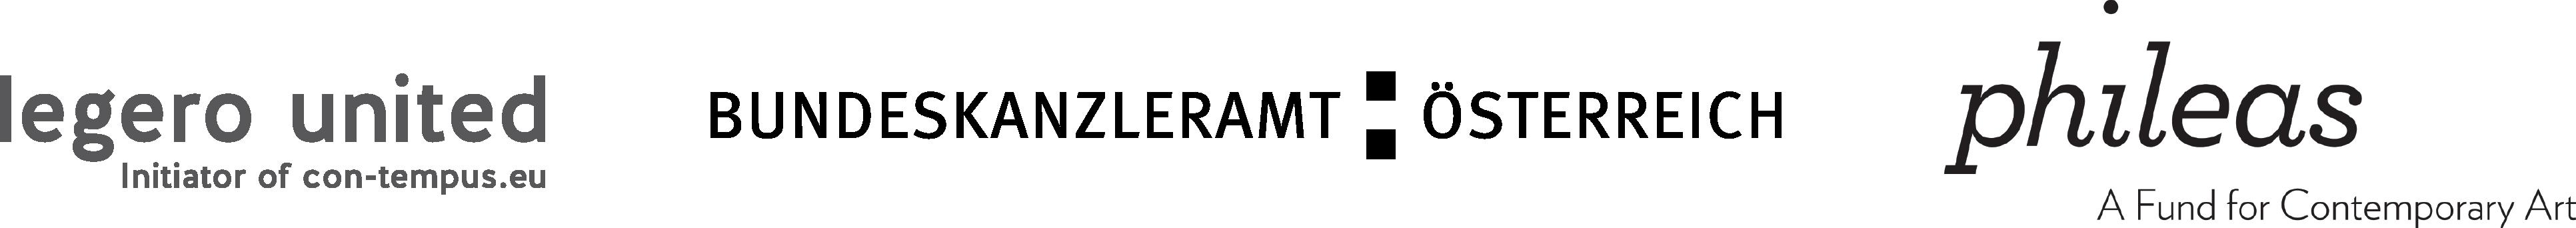 Logoleiste_phileas_